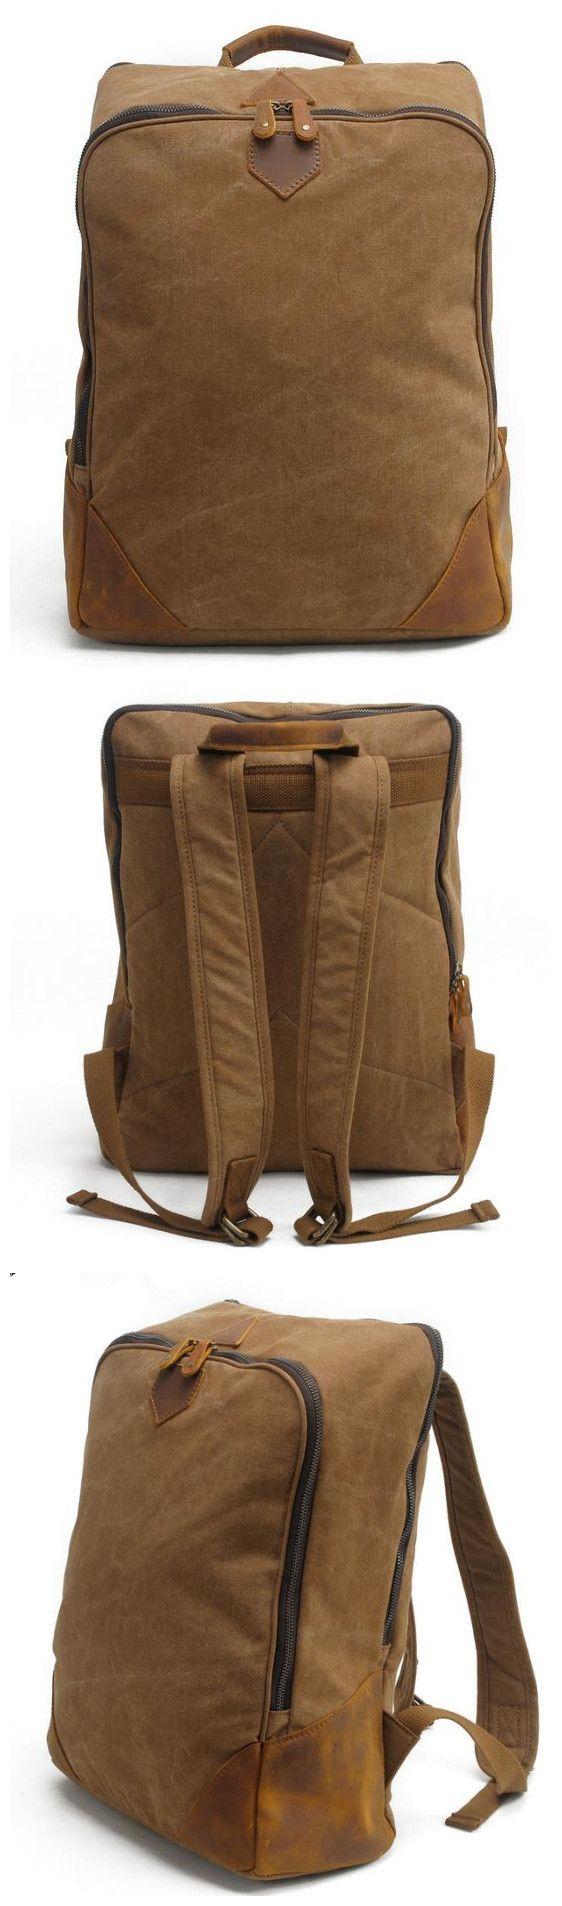 Waxed Canvas Backpack Rucksack School Backpack